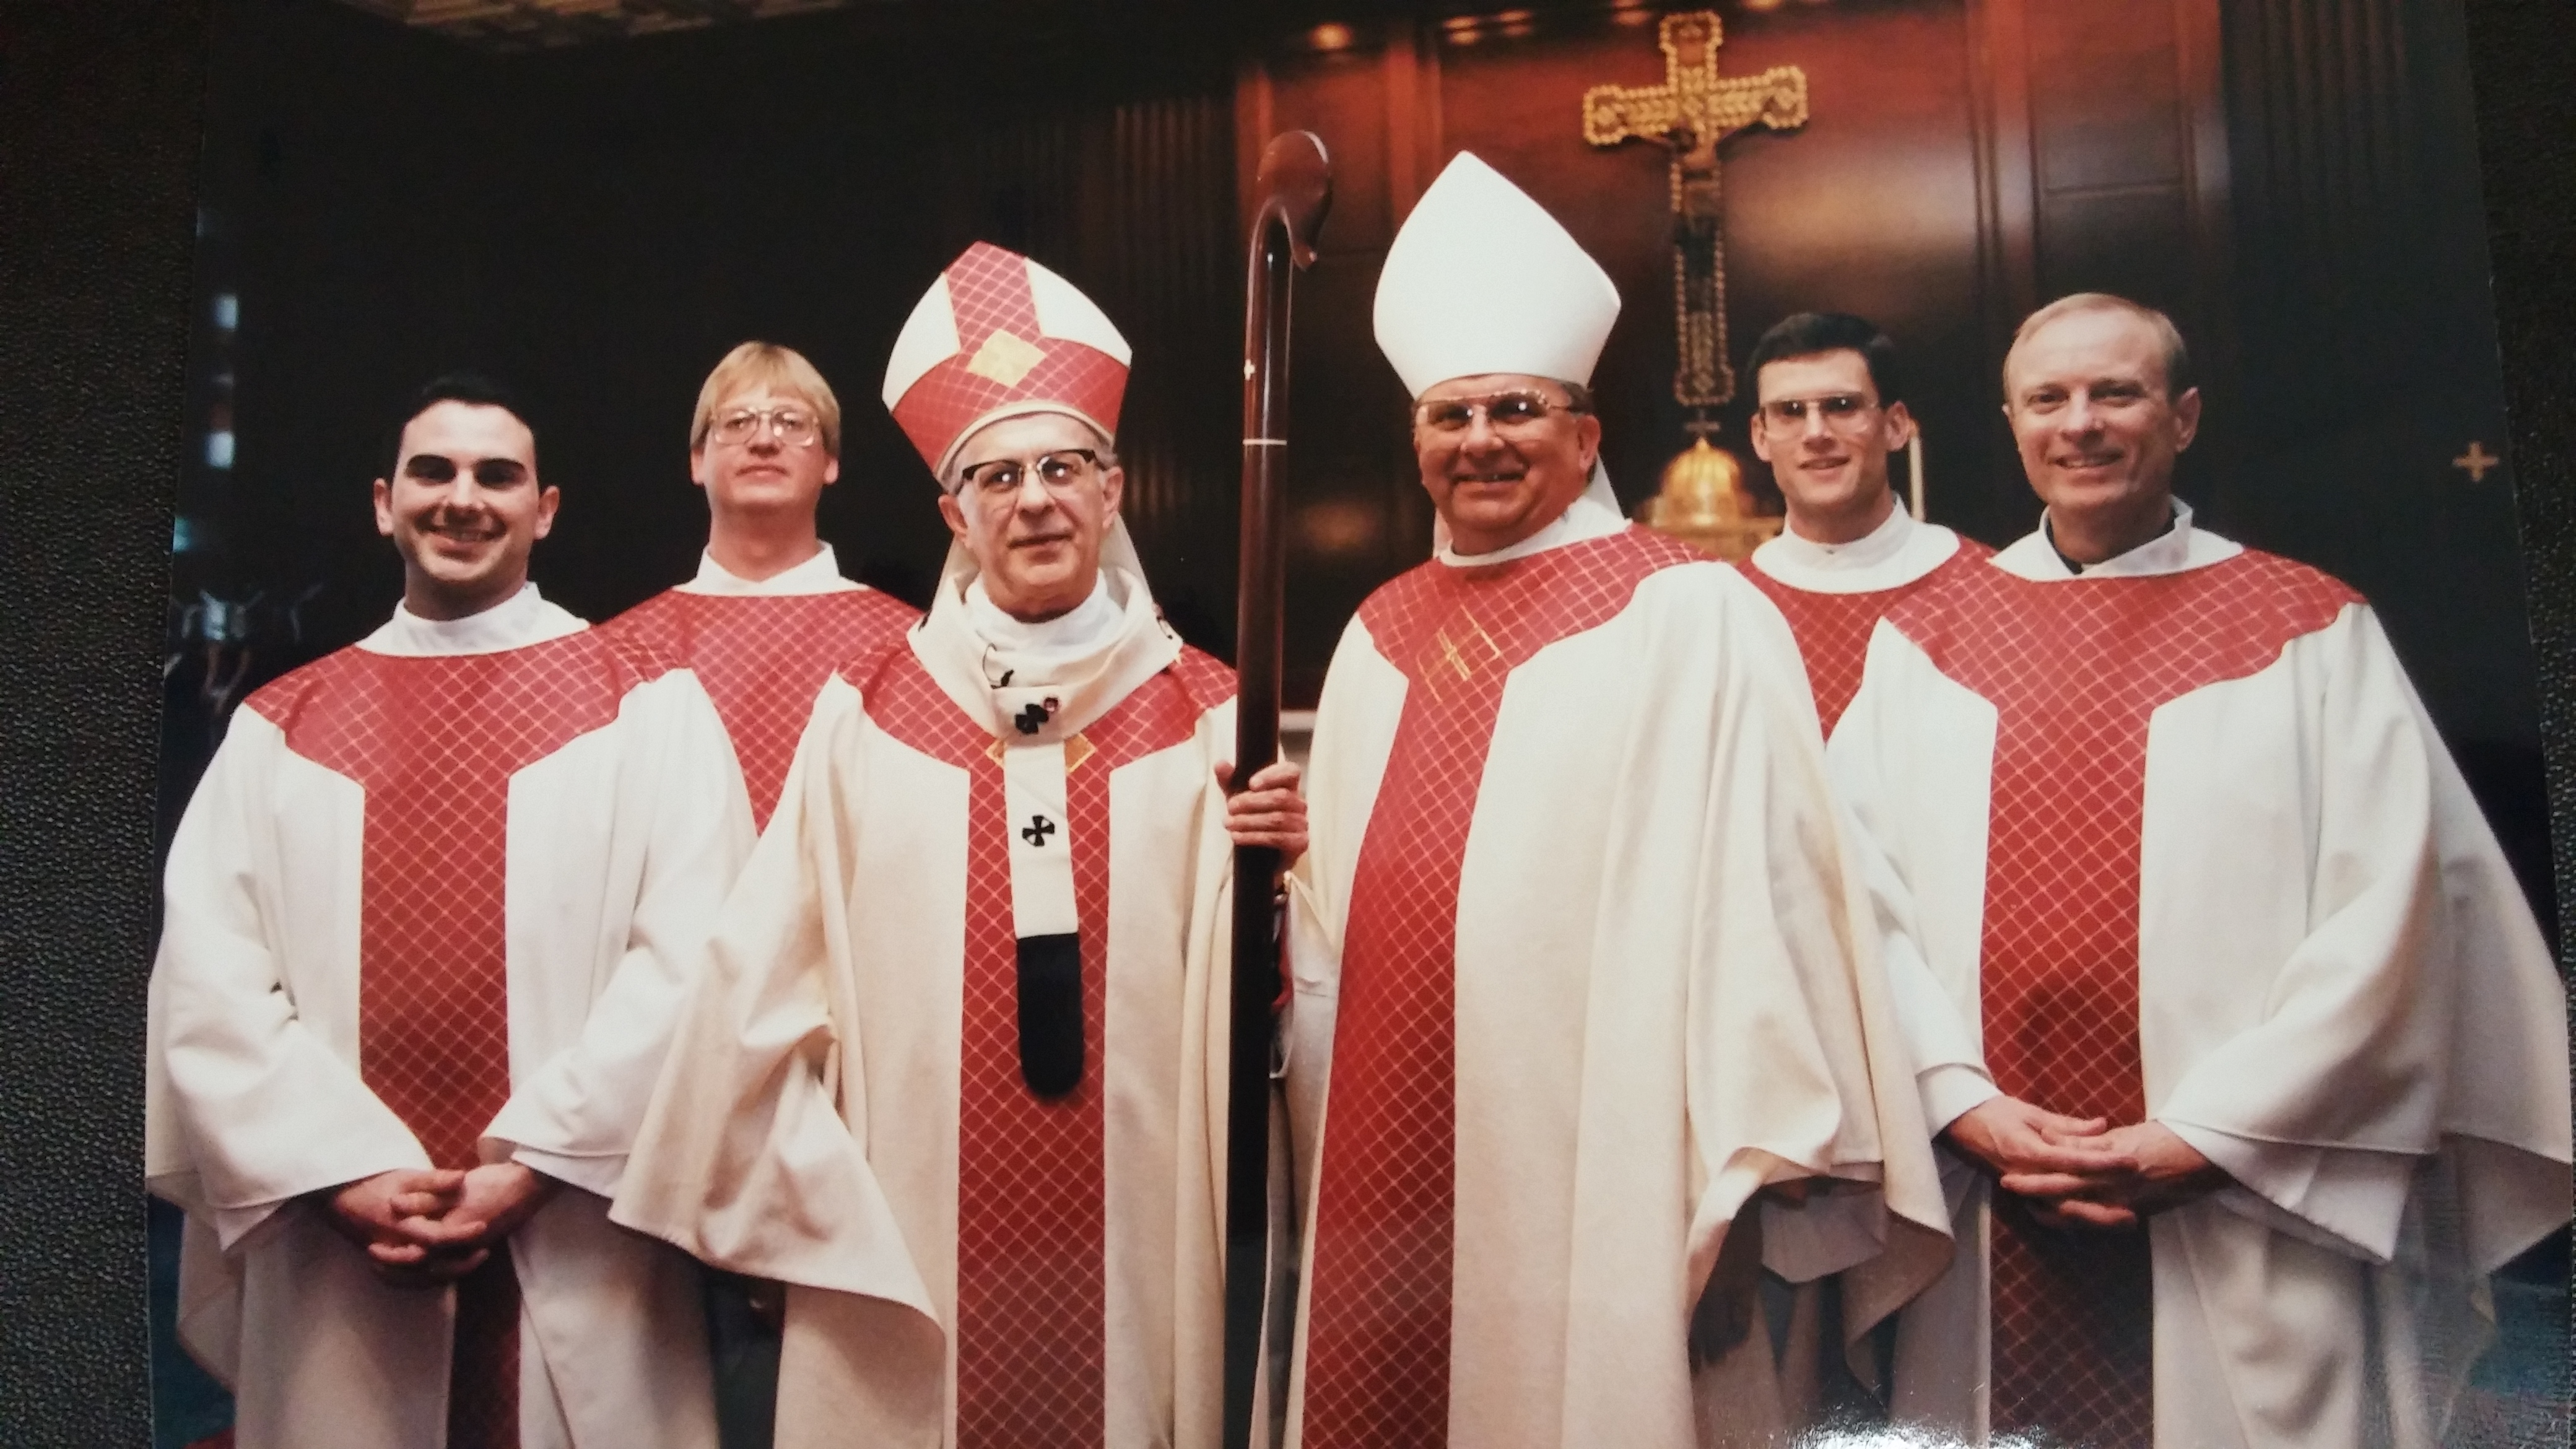 Archbishop Daniel Pilarczyk and Bishop Carl Moeddel with Fathers Jeffrey Fullmer, Mark Meyer, Patrick Sloneker, Ronald Piepmeyer